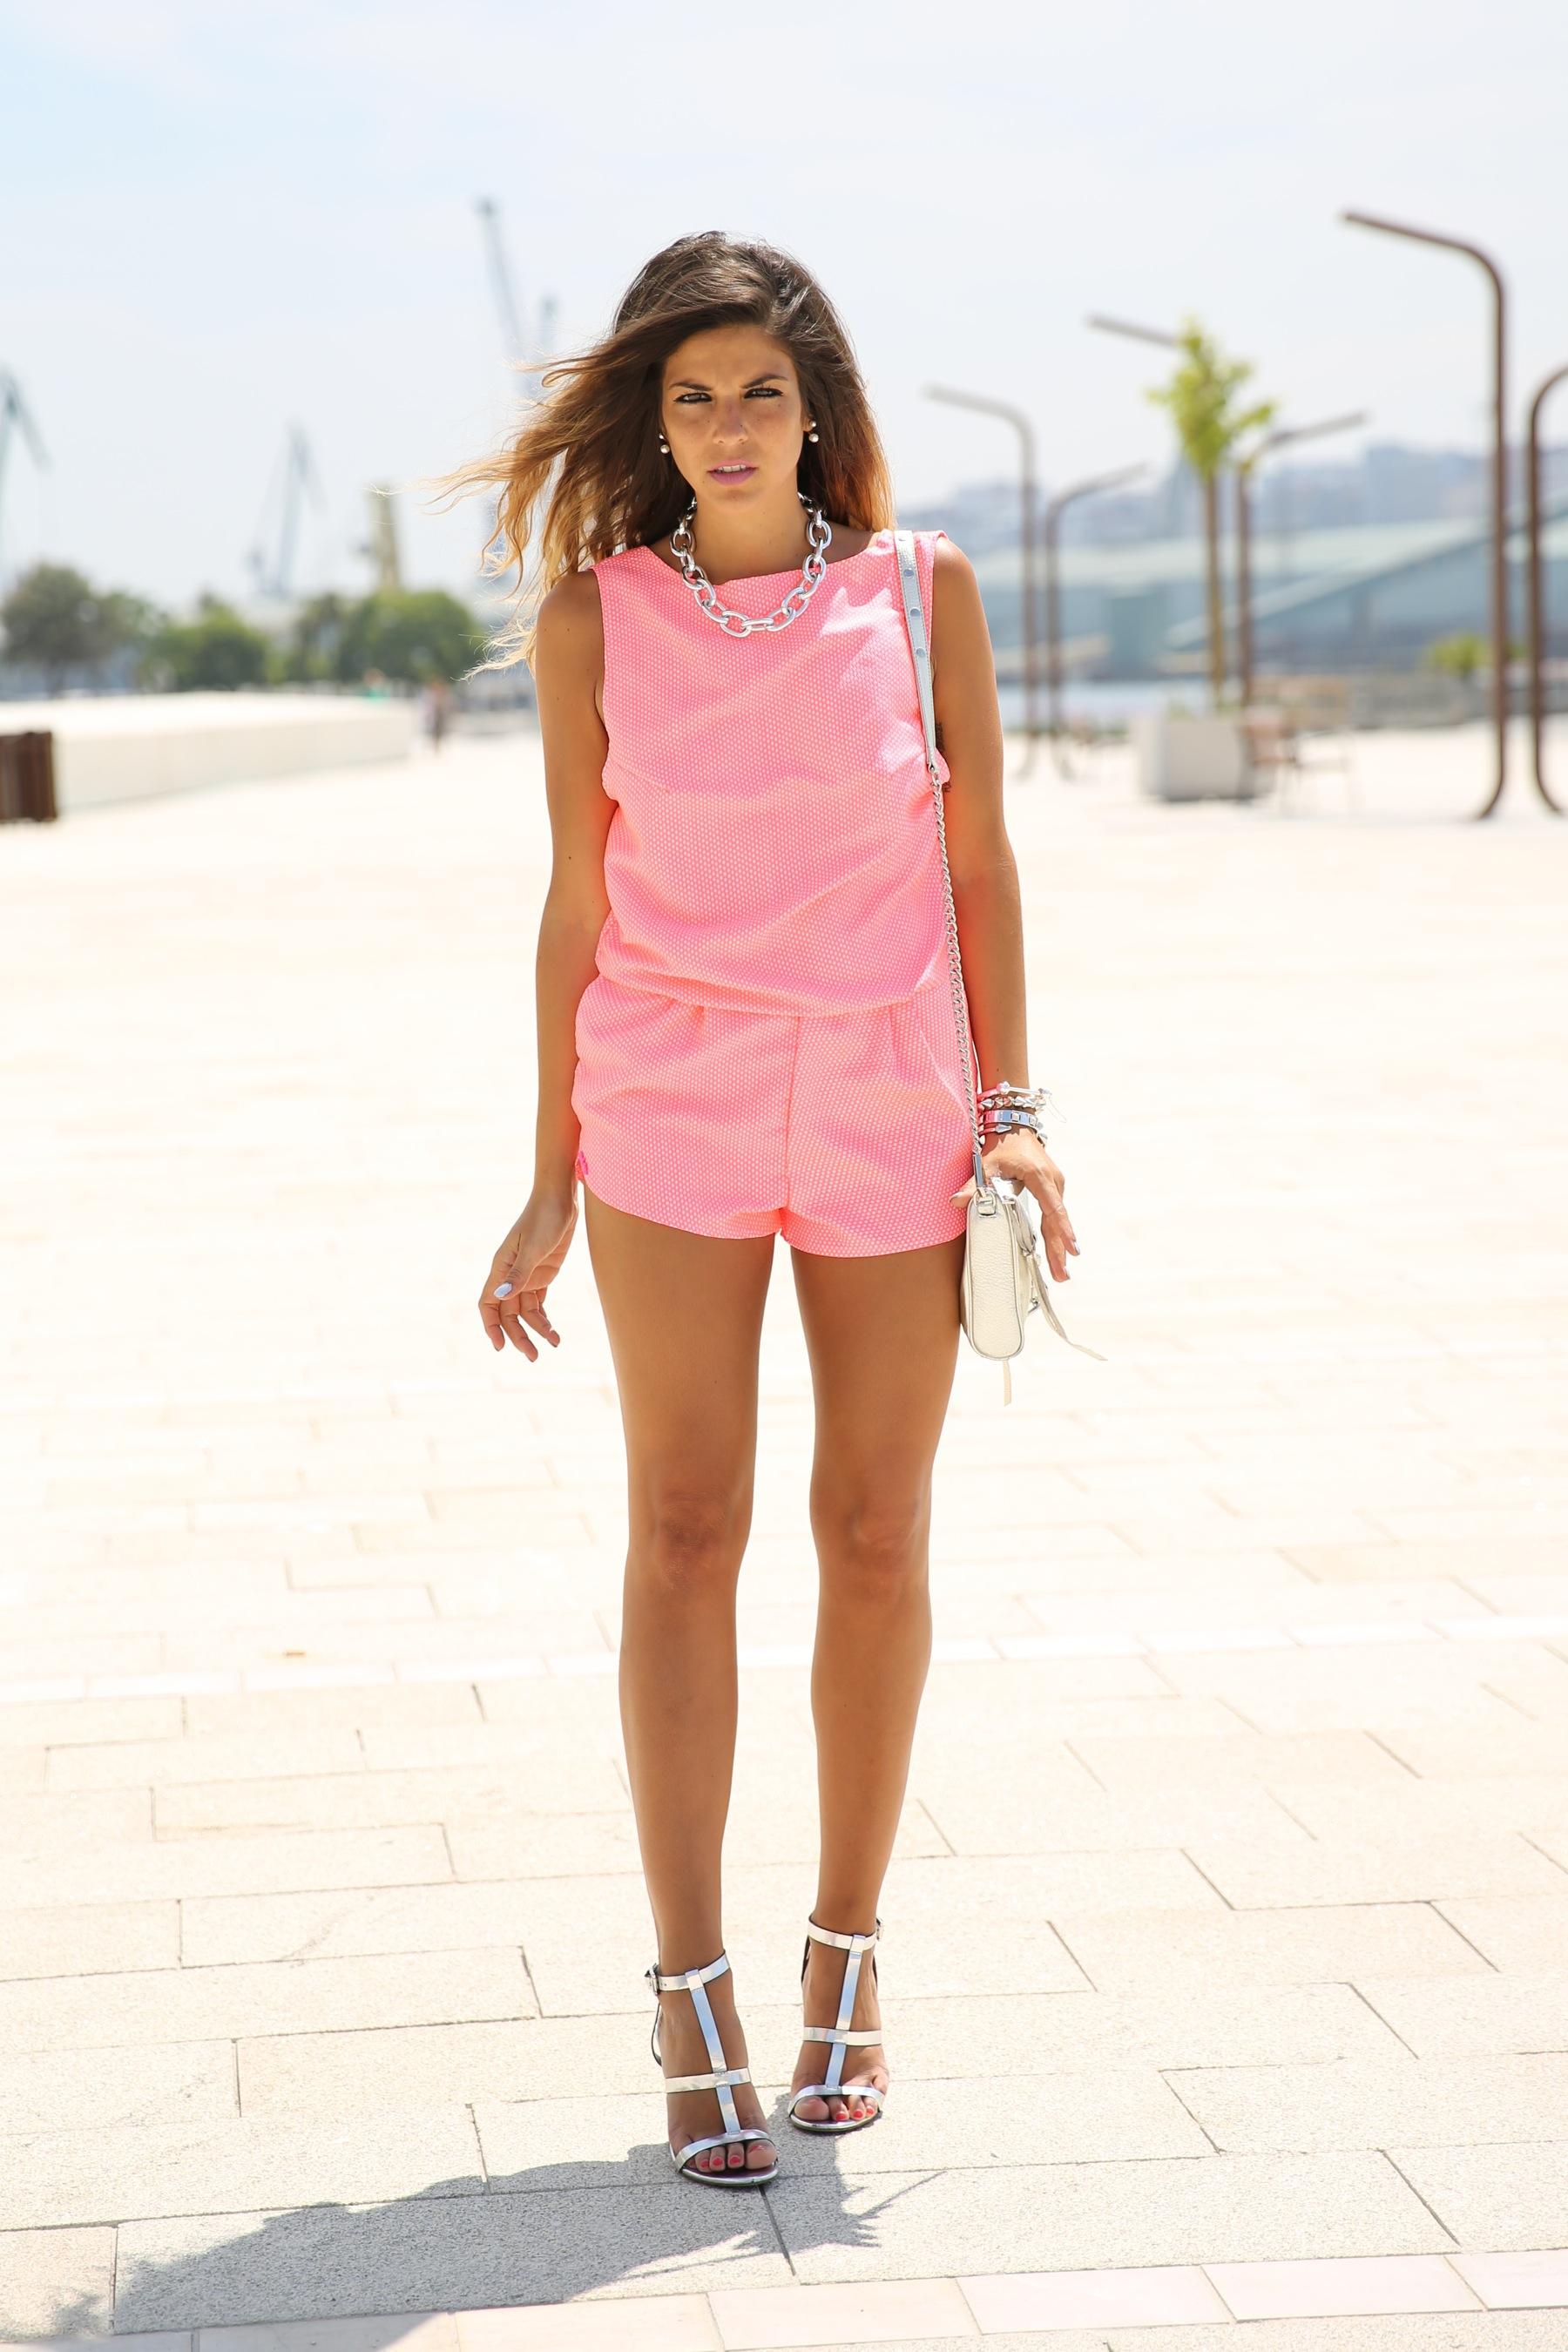 trendy_taste-look-outfit-street_style-ootd-blog-blogger-fashion_spain-moda_españa-silver_bag-bolso_plata-mono_rosa-mekdes-coruña-marina-13